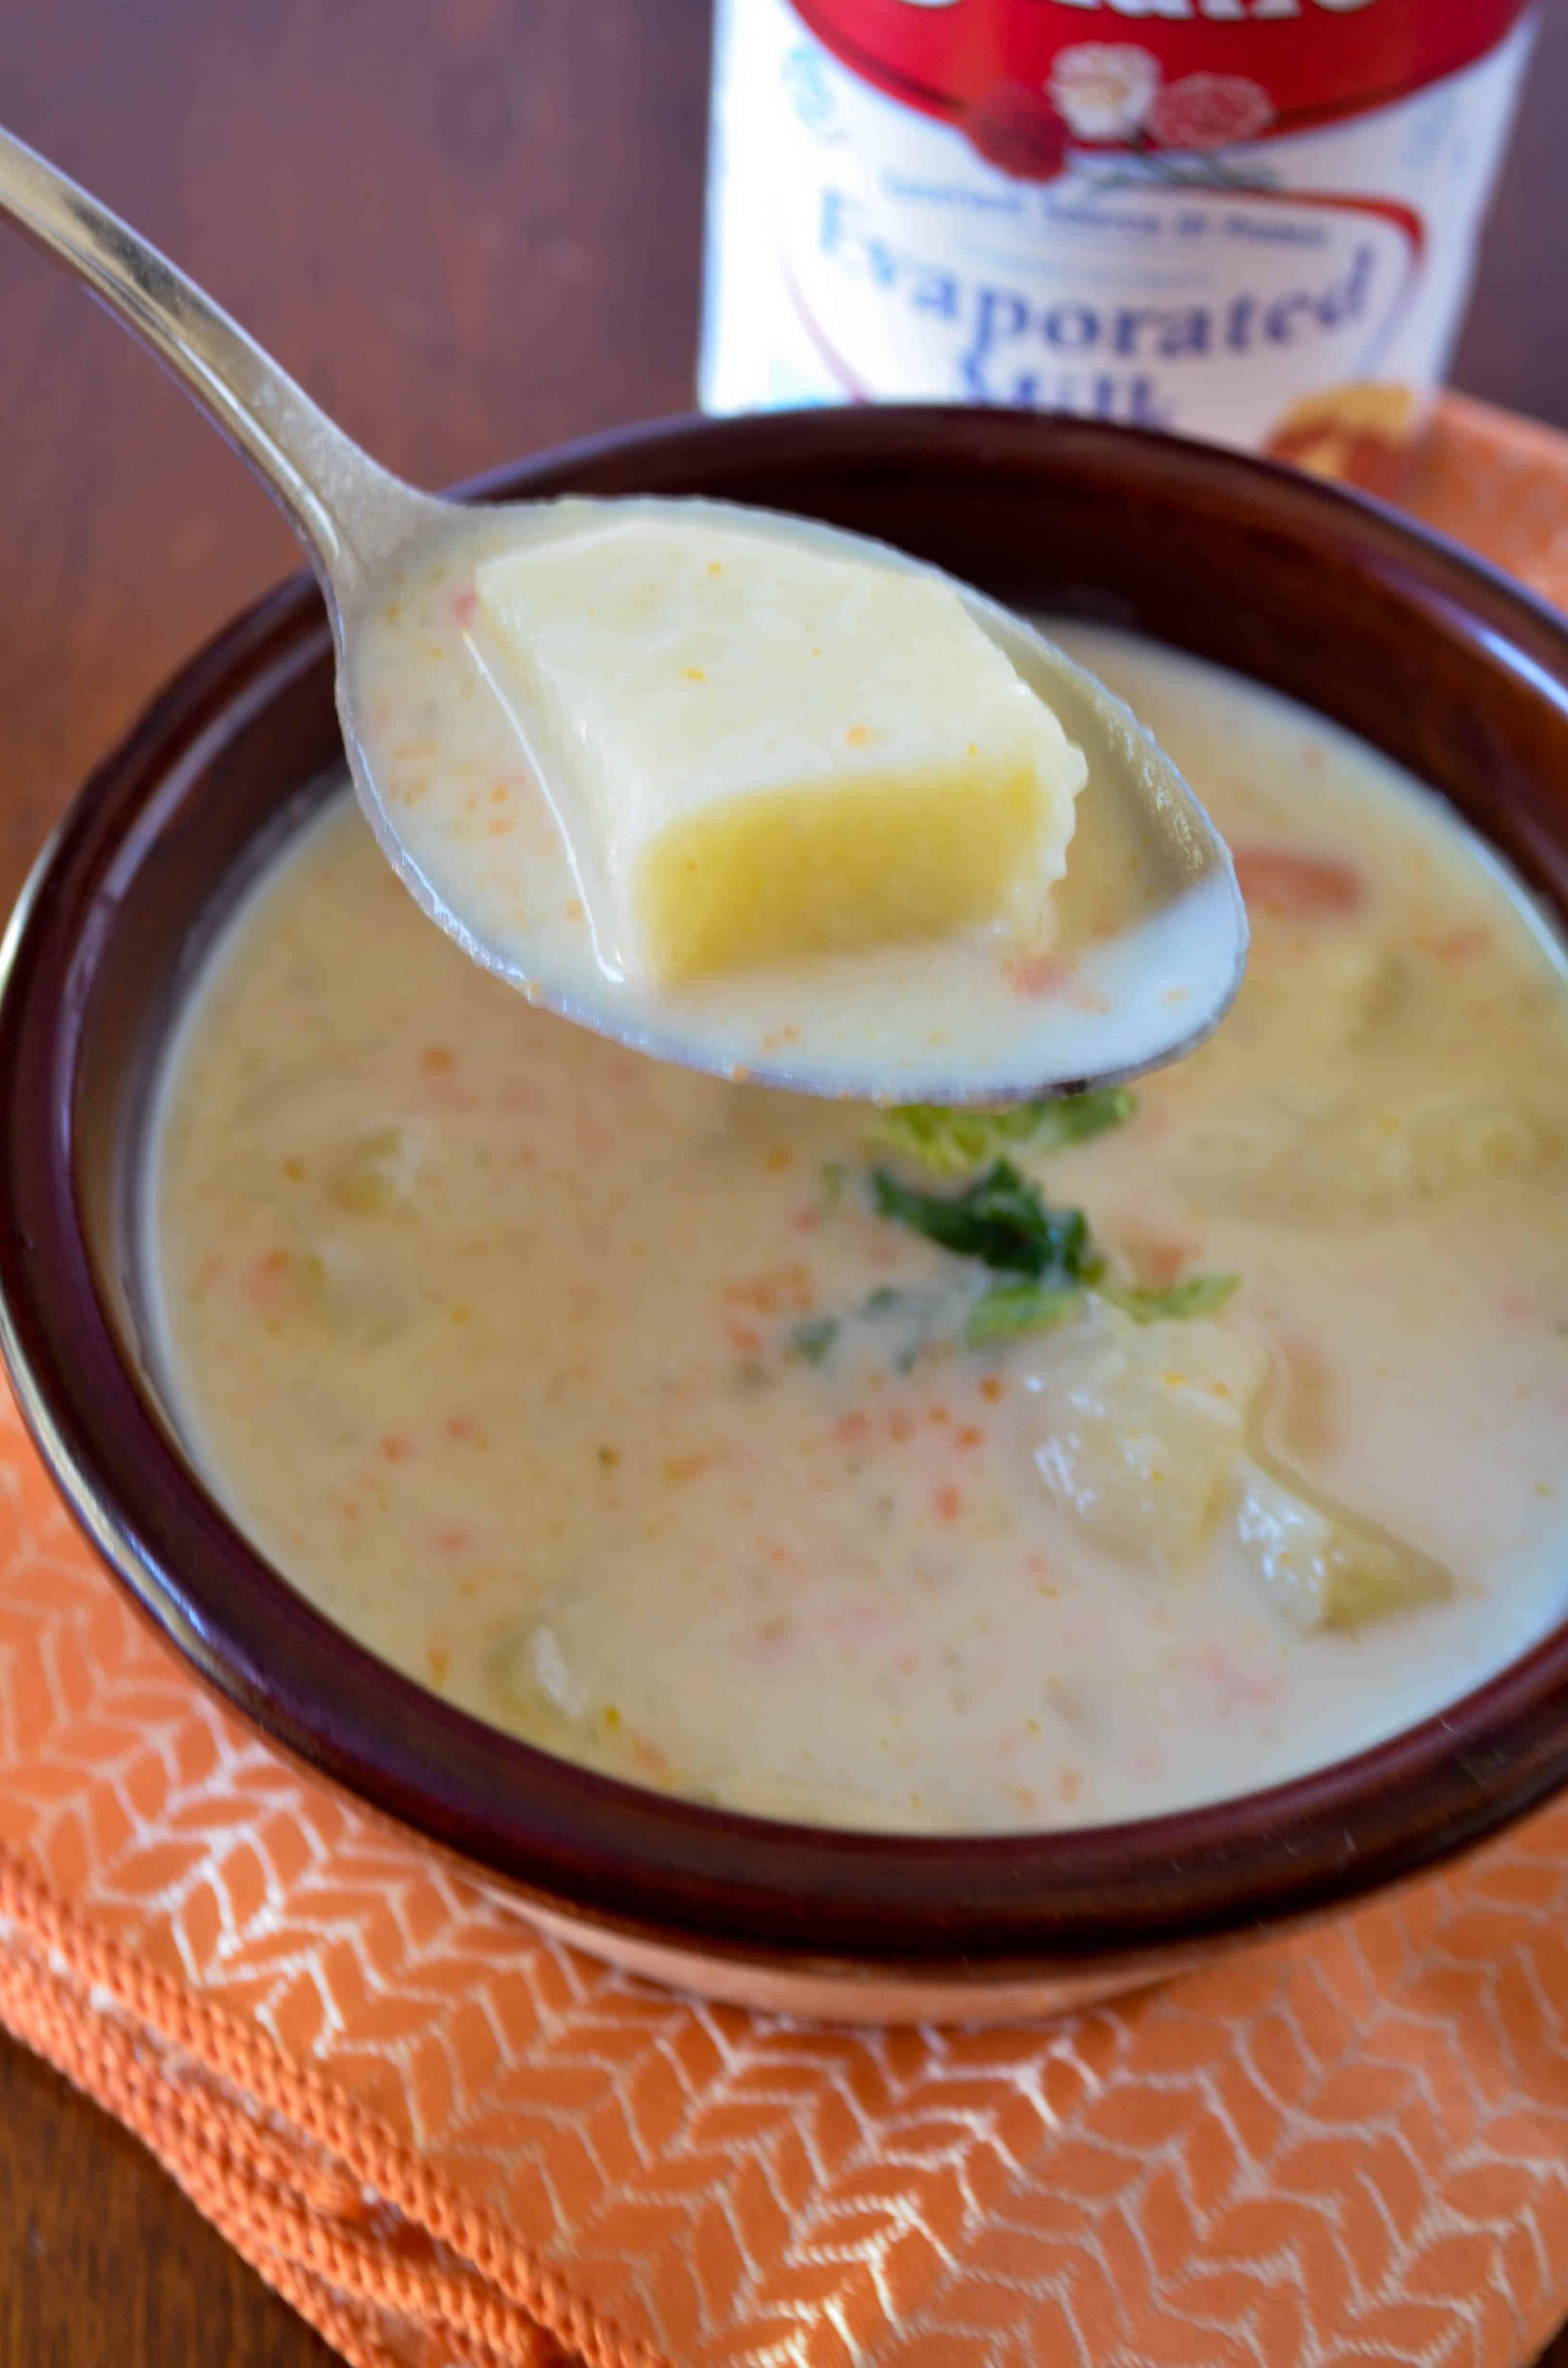 Healthy Potato Soup Recipe Easy  Creamy Potato Chowder A healthy soup recipe for your